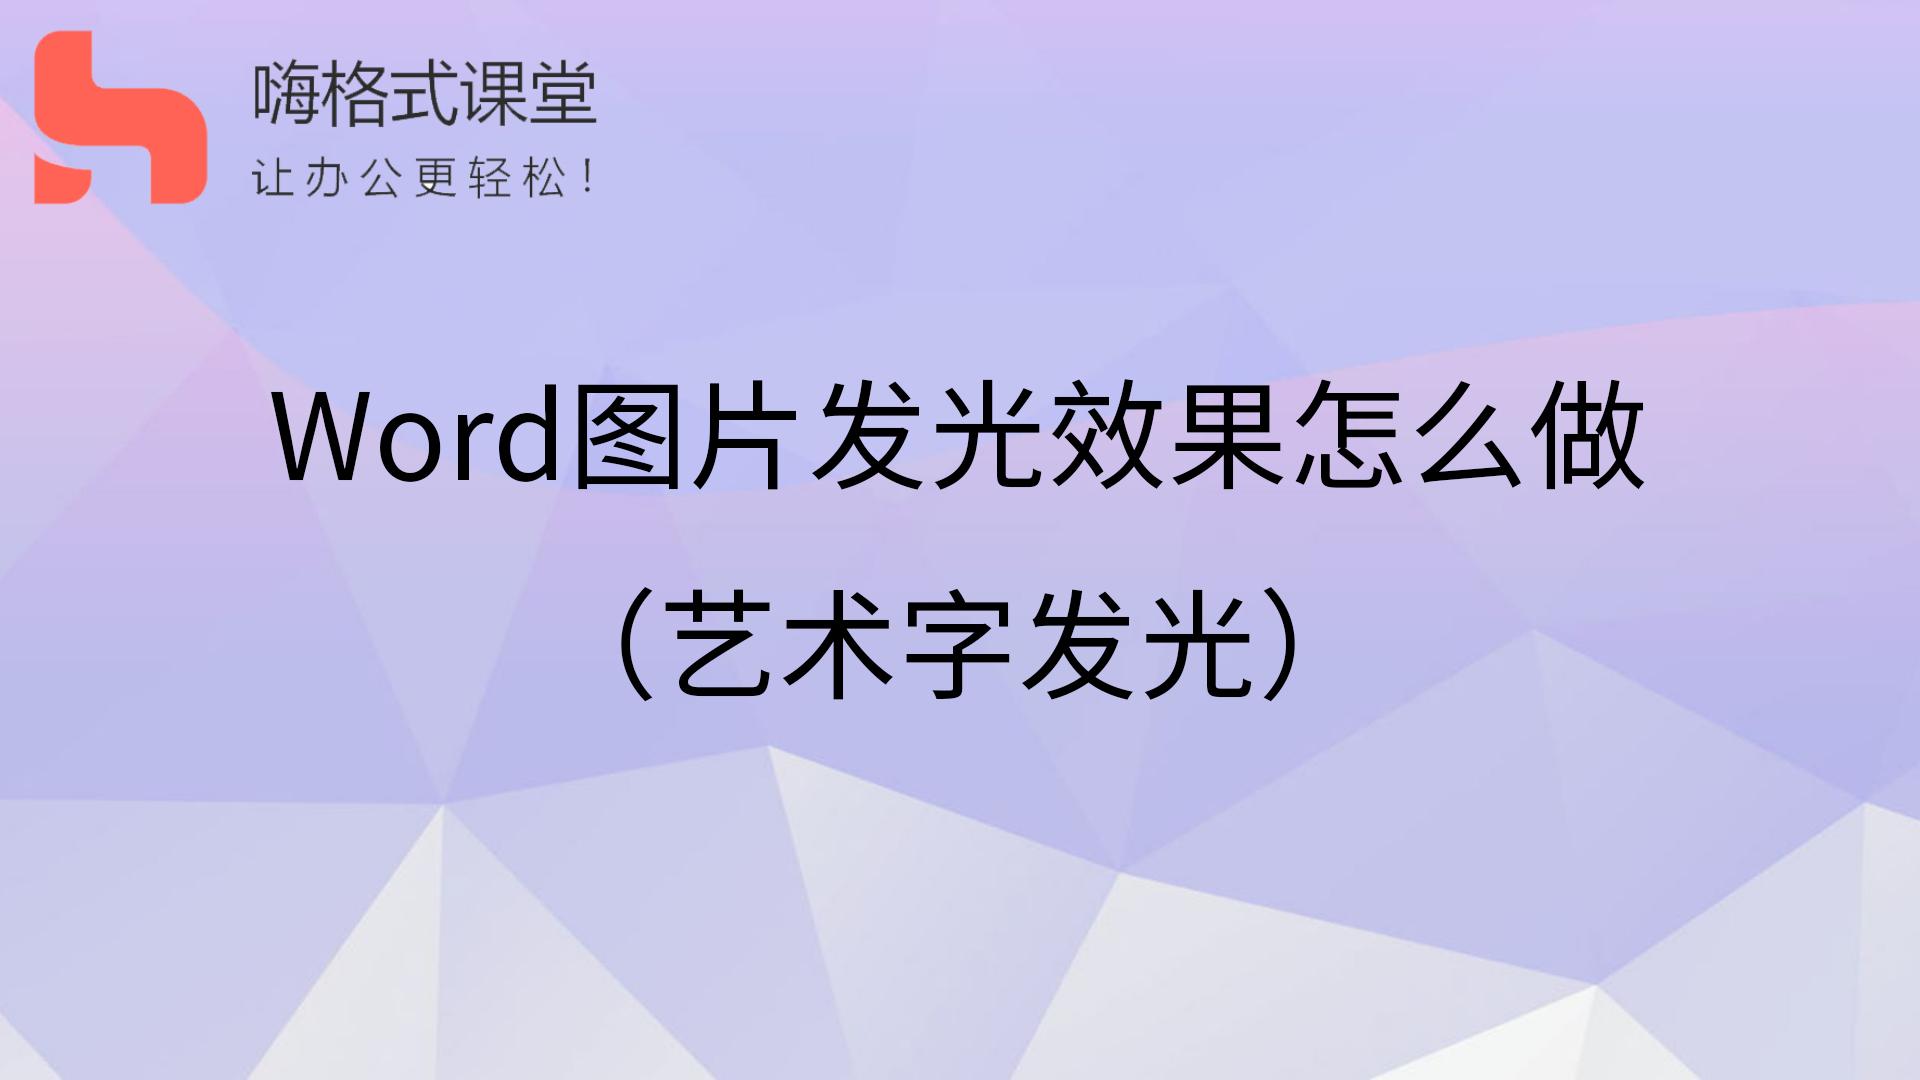 Word图片发光效果怎么做(艺术字发光)